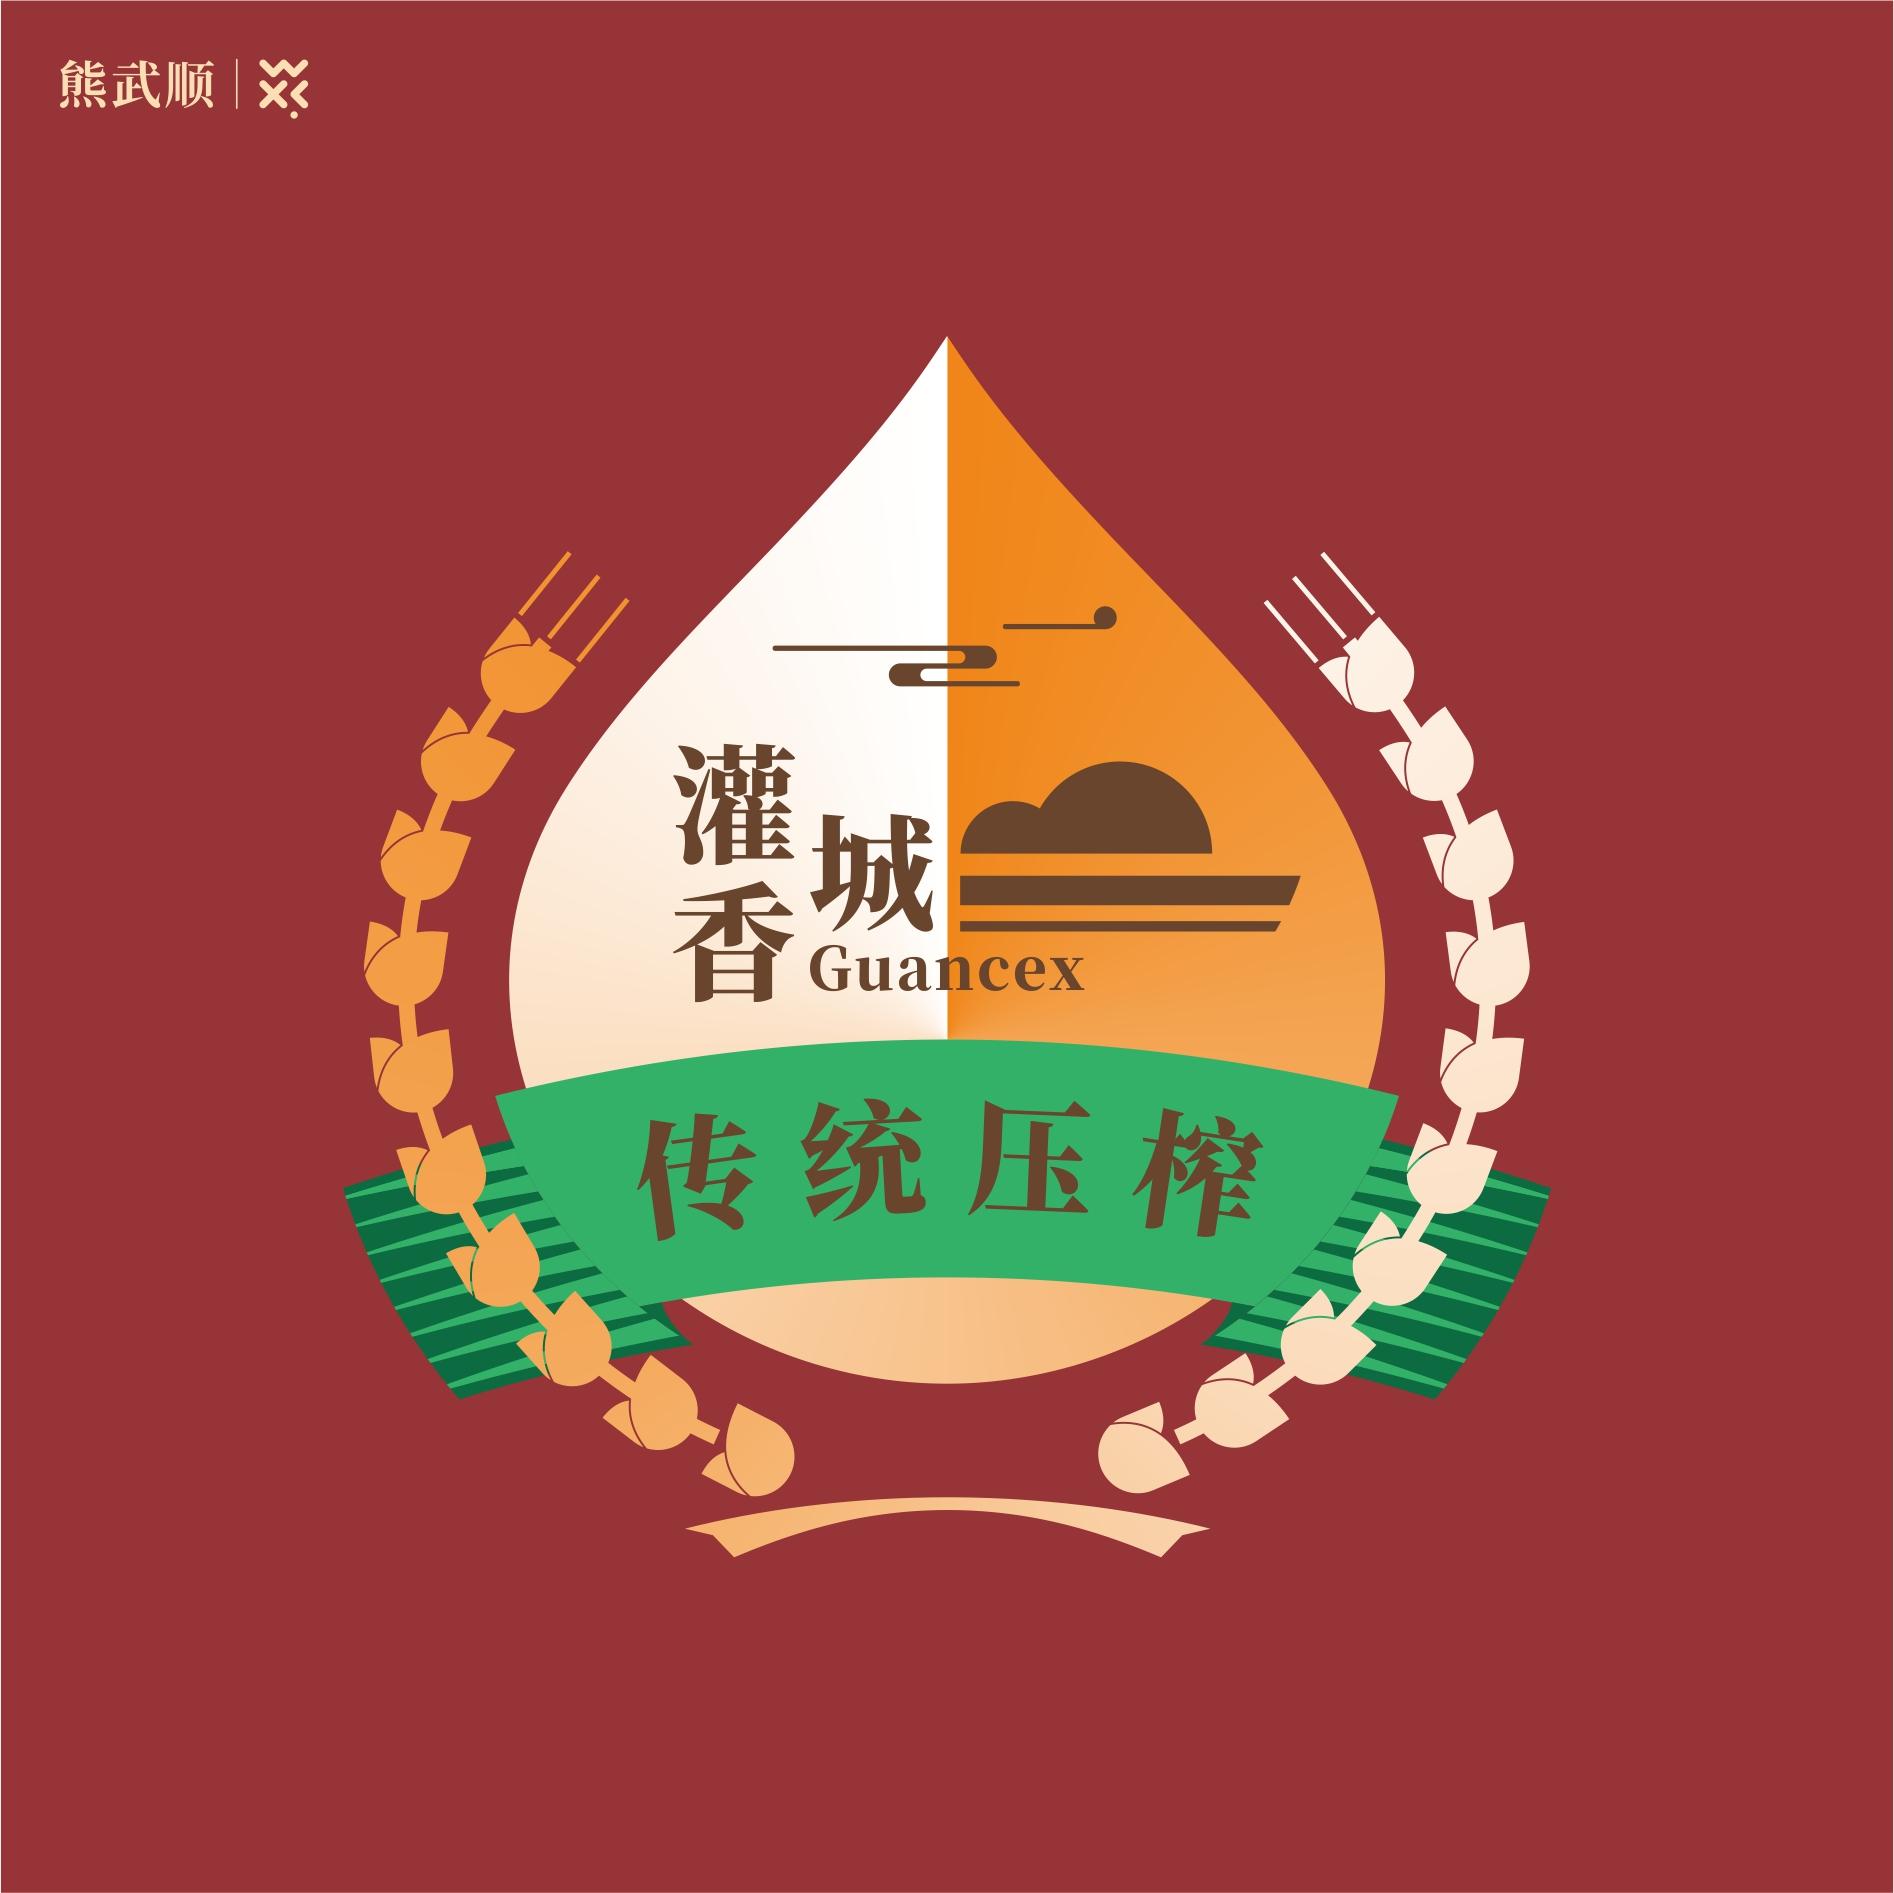 LOGO创意设计,品牌:灌城香(6.11附件有更新)_3033553_k68威客网